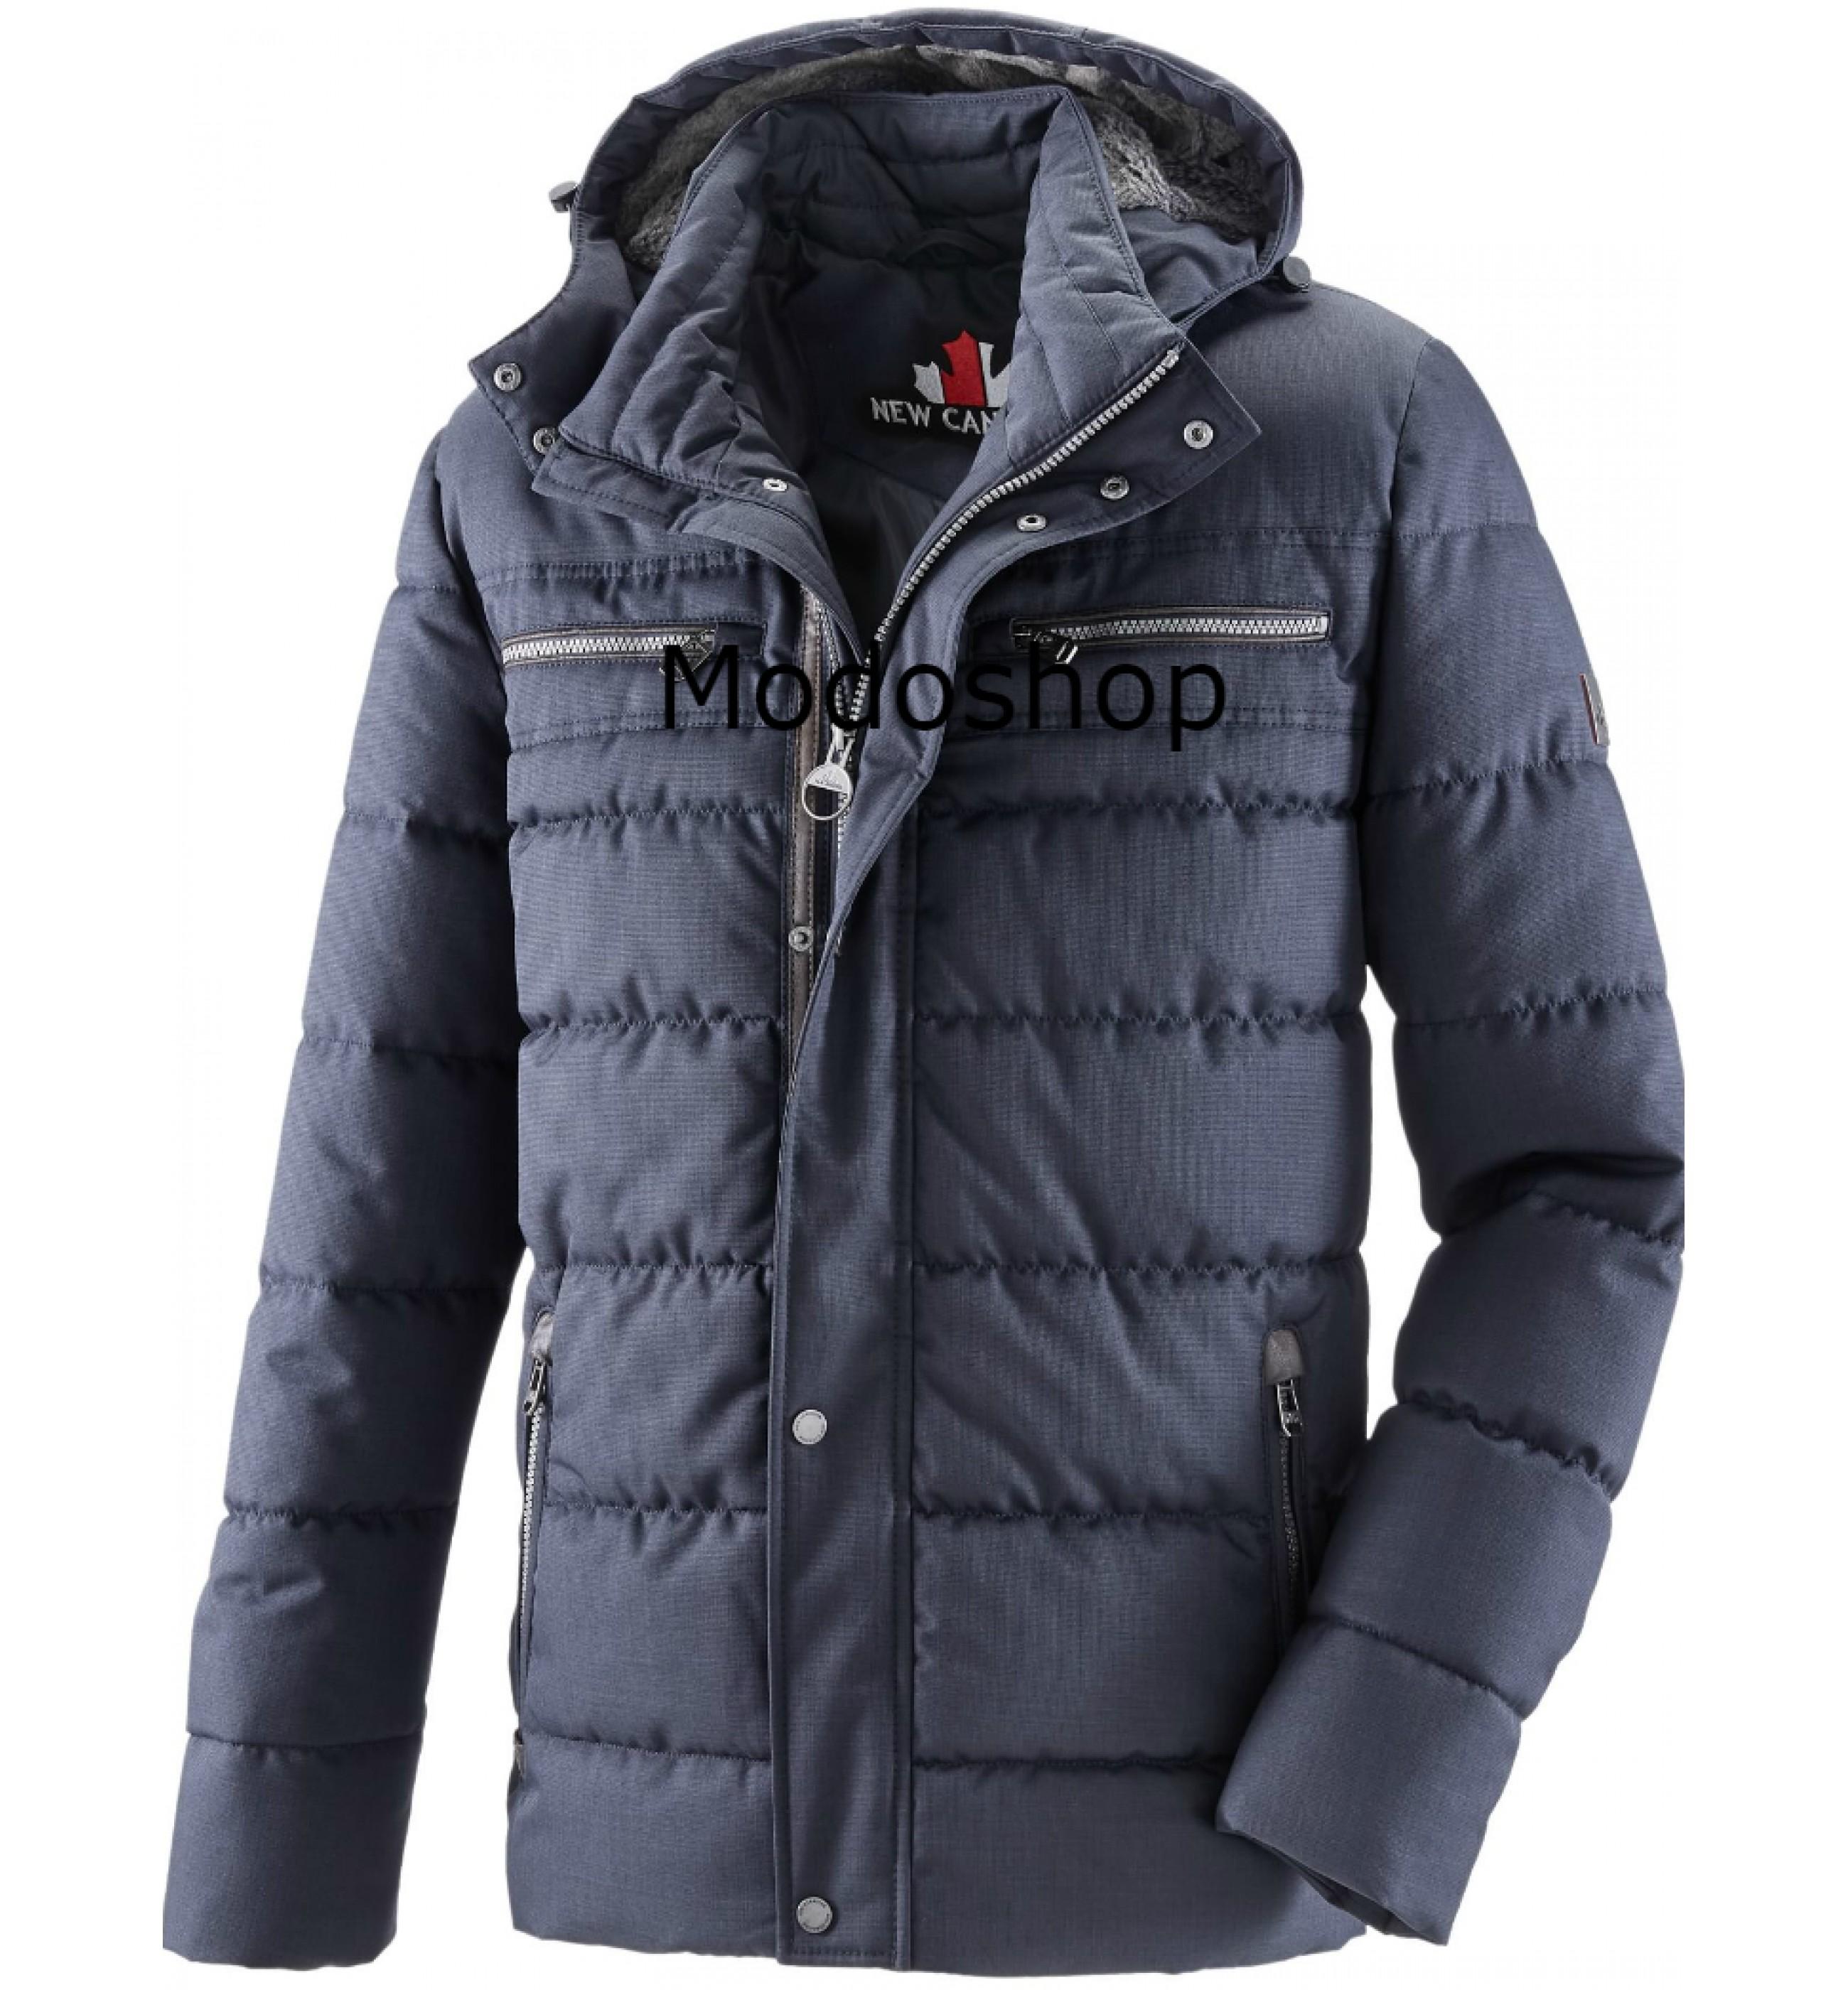 Куртка мужская Cabano New Canadian 8131 32029